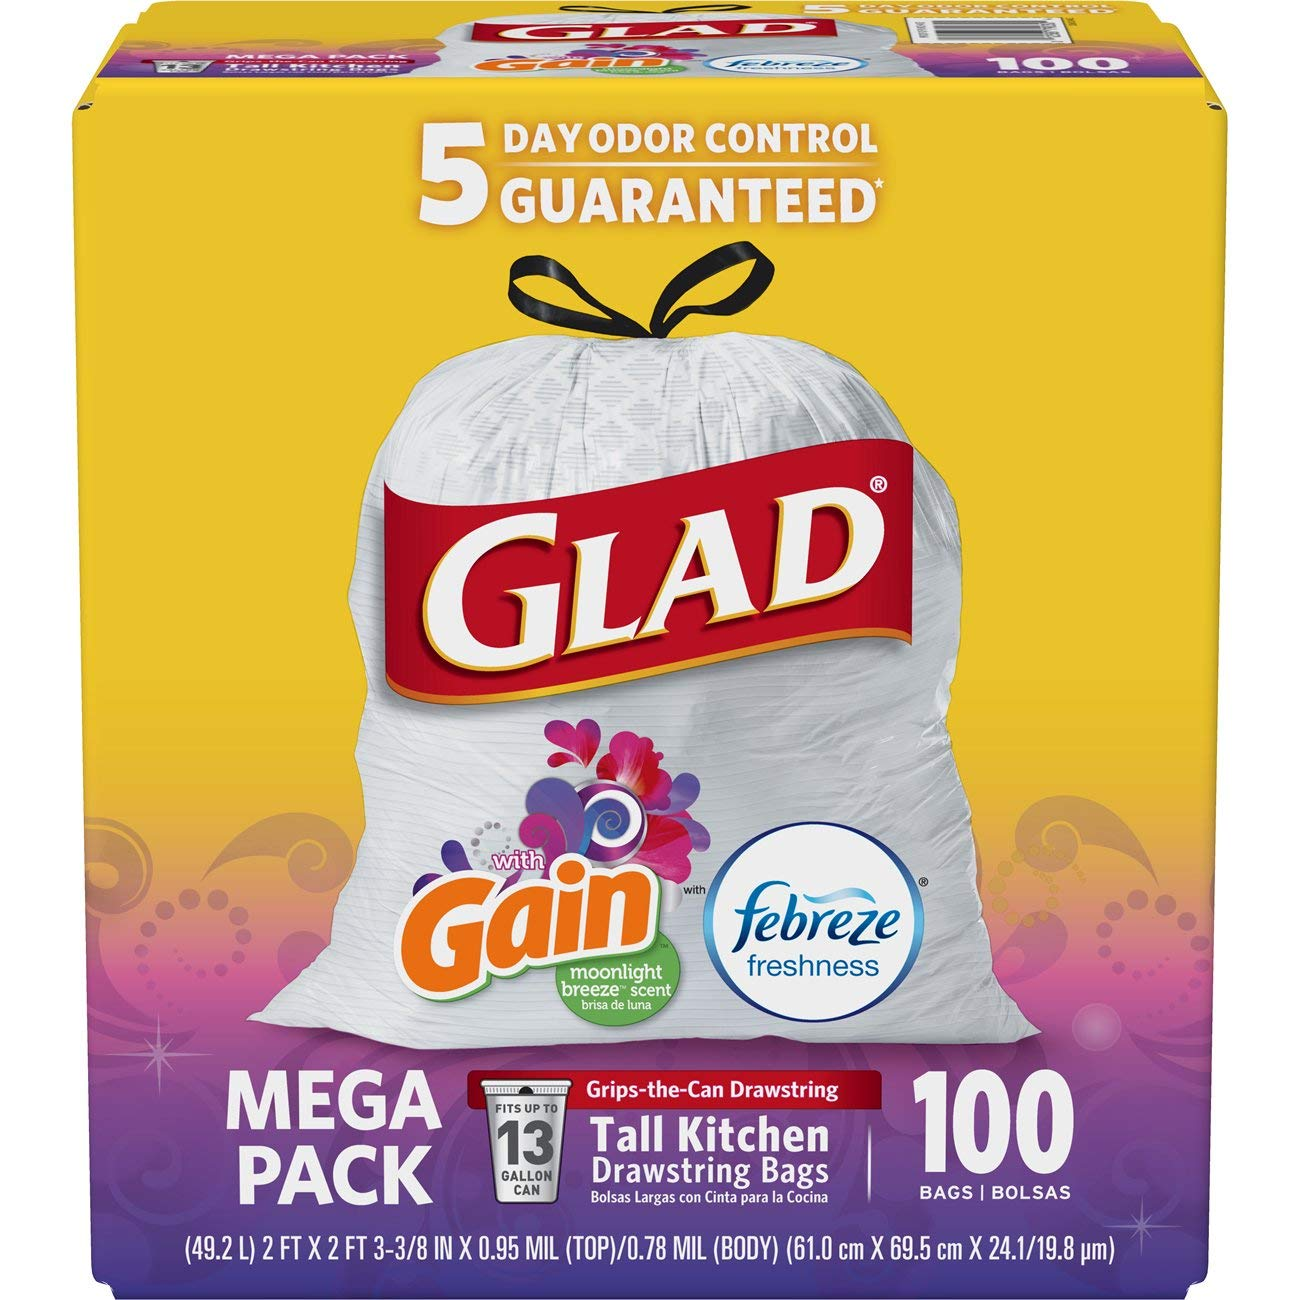 Glad Tall Kitchen Drawstring Trash Bags   Odor Shield 13 Gallon White Trash Bag, Gain Moonlight Breeze   100 Count by Glad